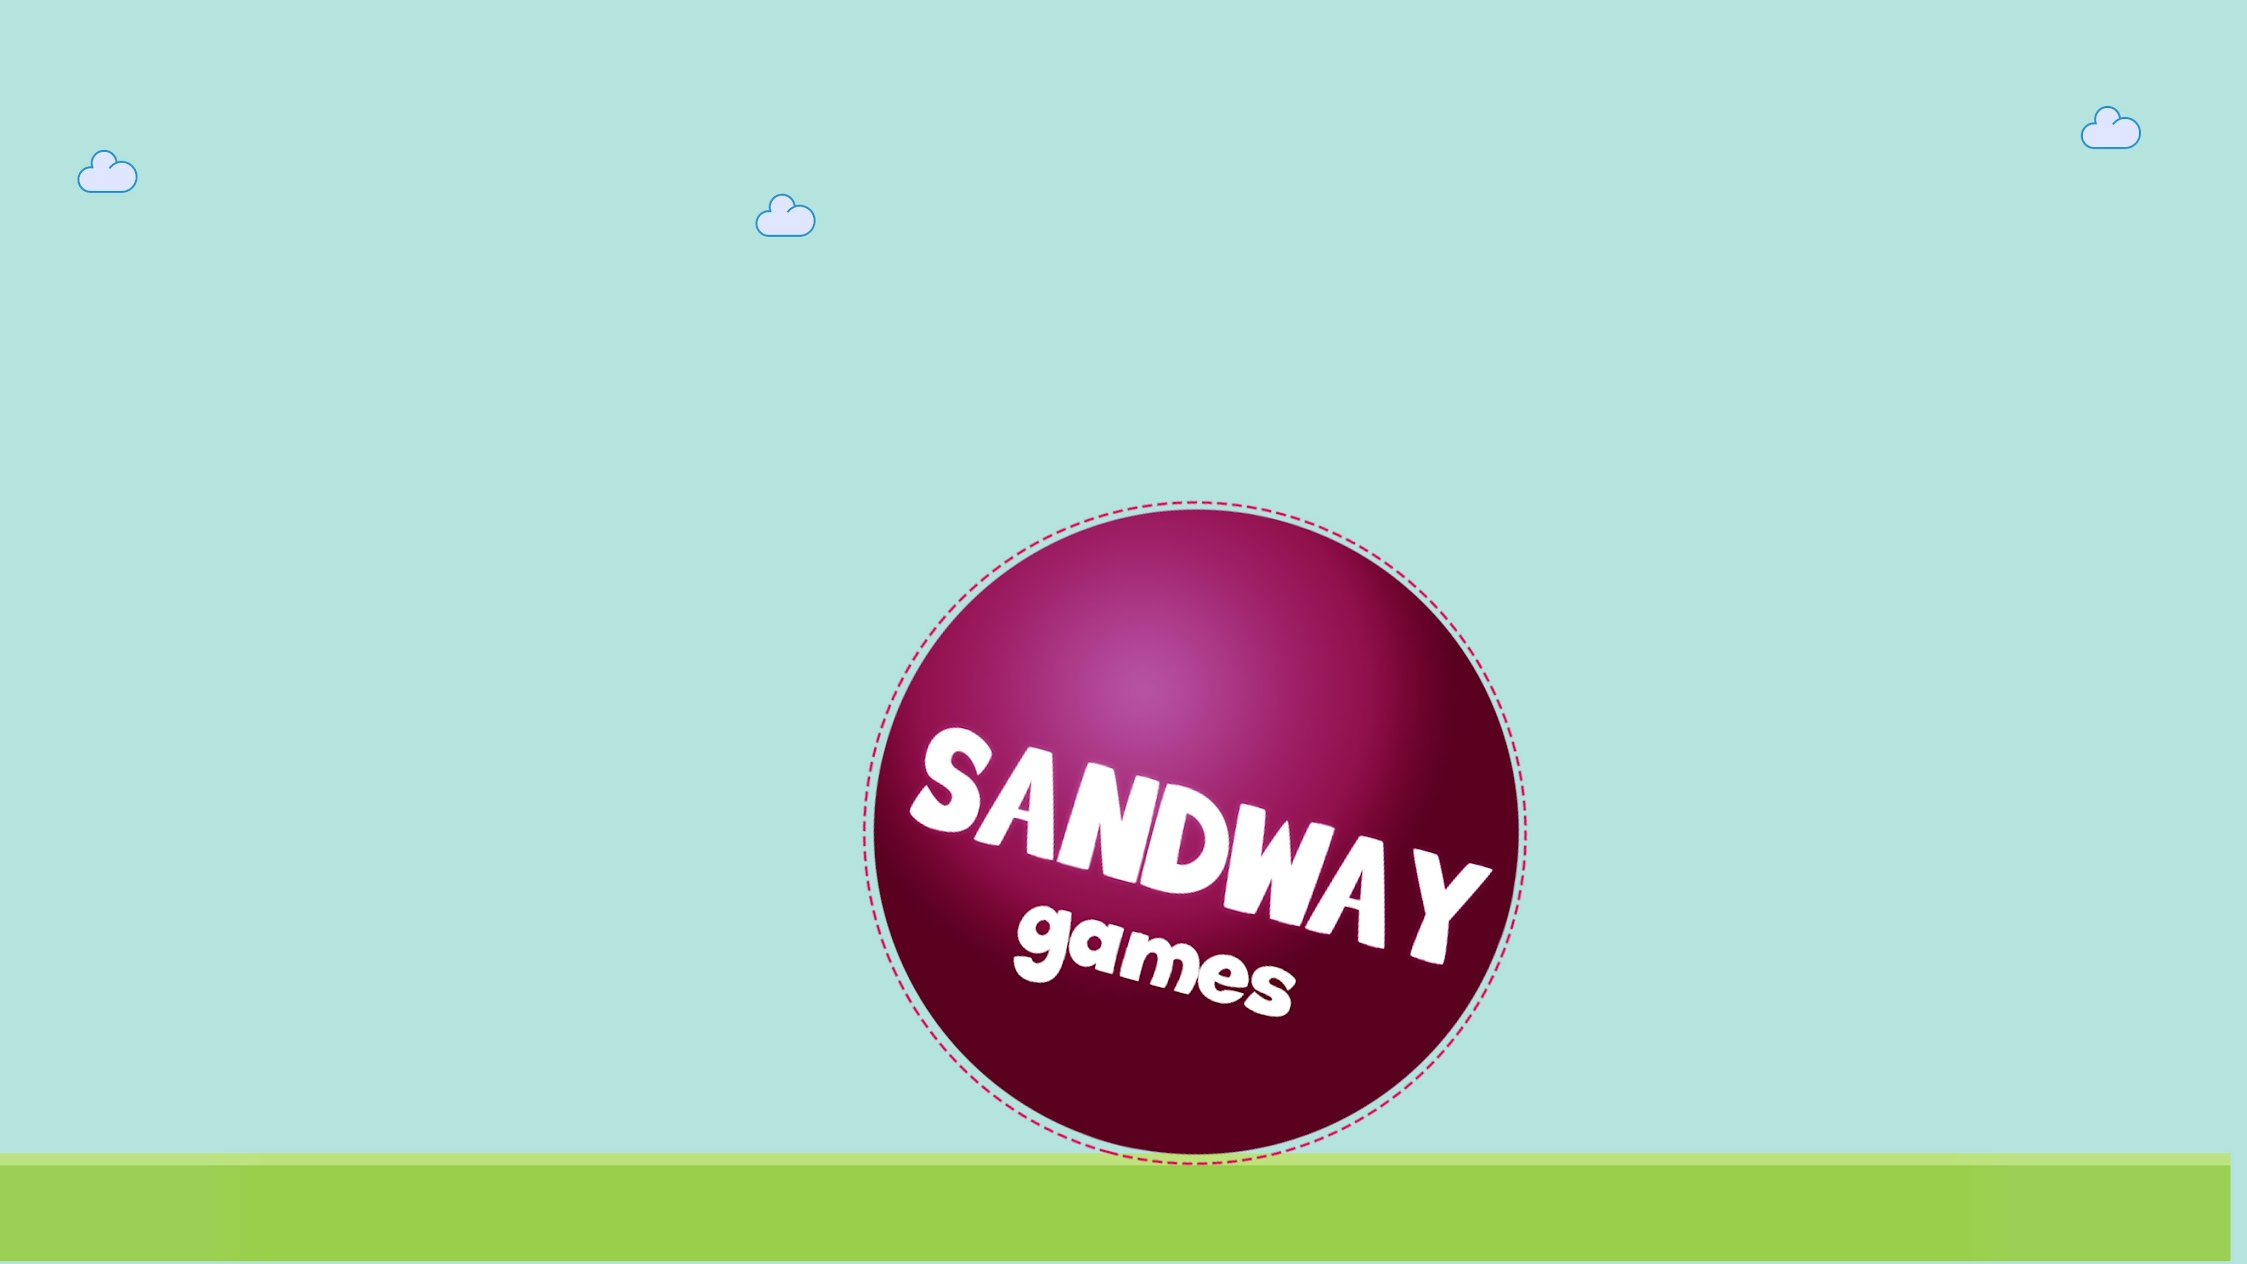 Sandway